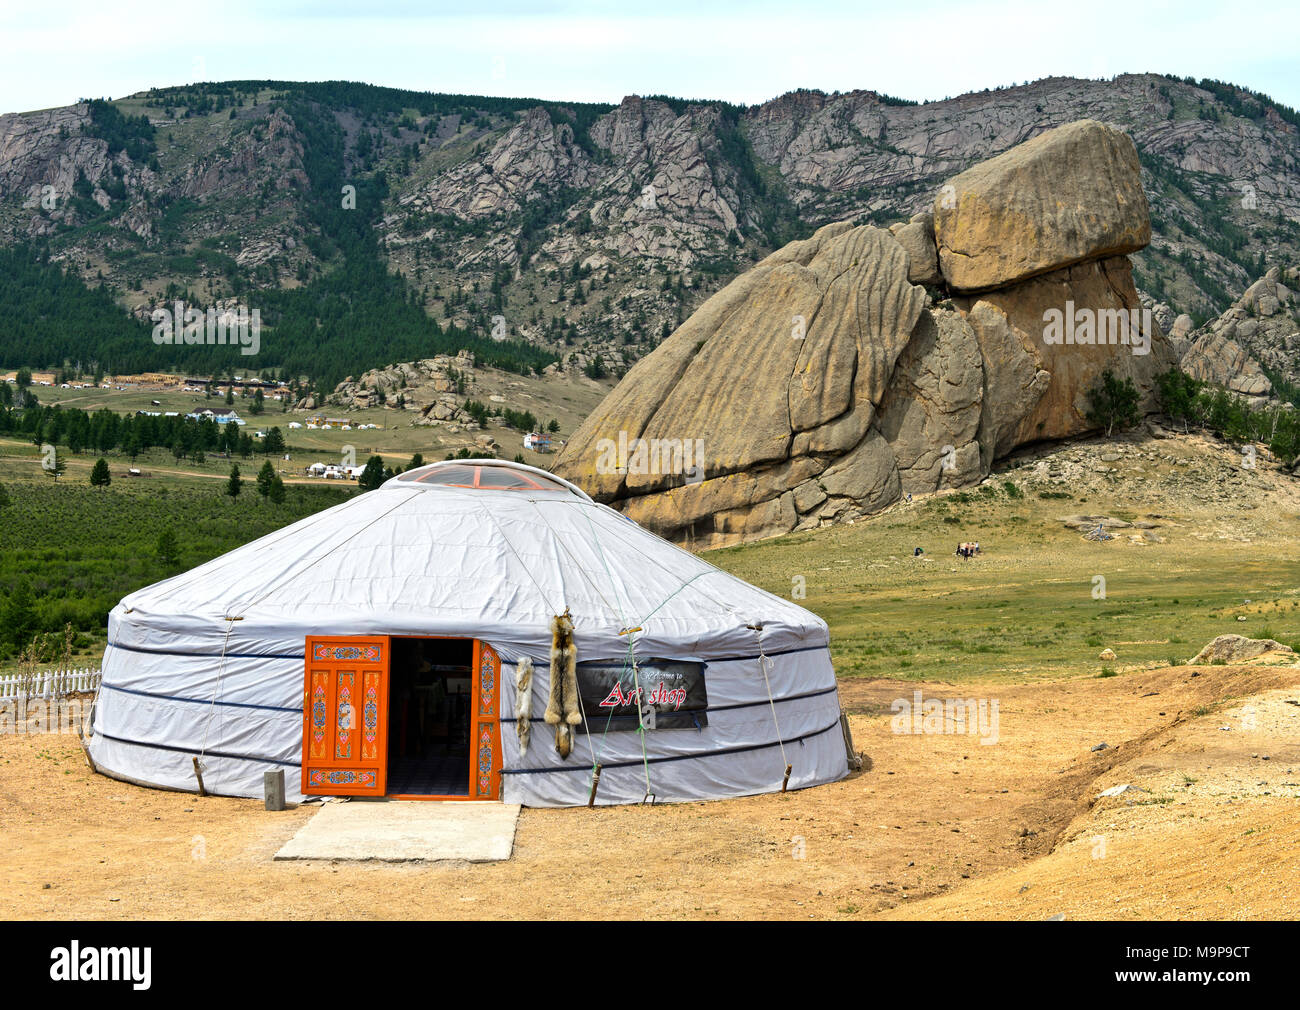 Yurt in front of the rock formation turtle, Melkhii Khad, Gorchi-Tereldsch National Park, Tereldsch, Mongolia - Stock Image